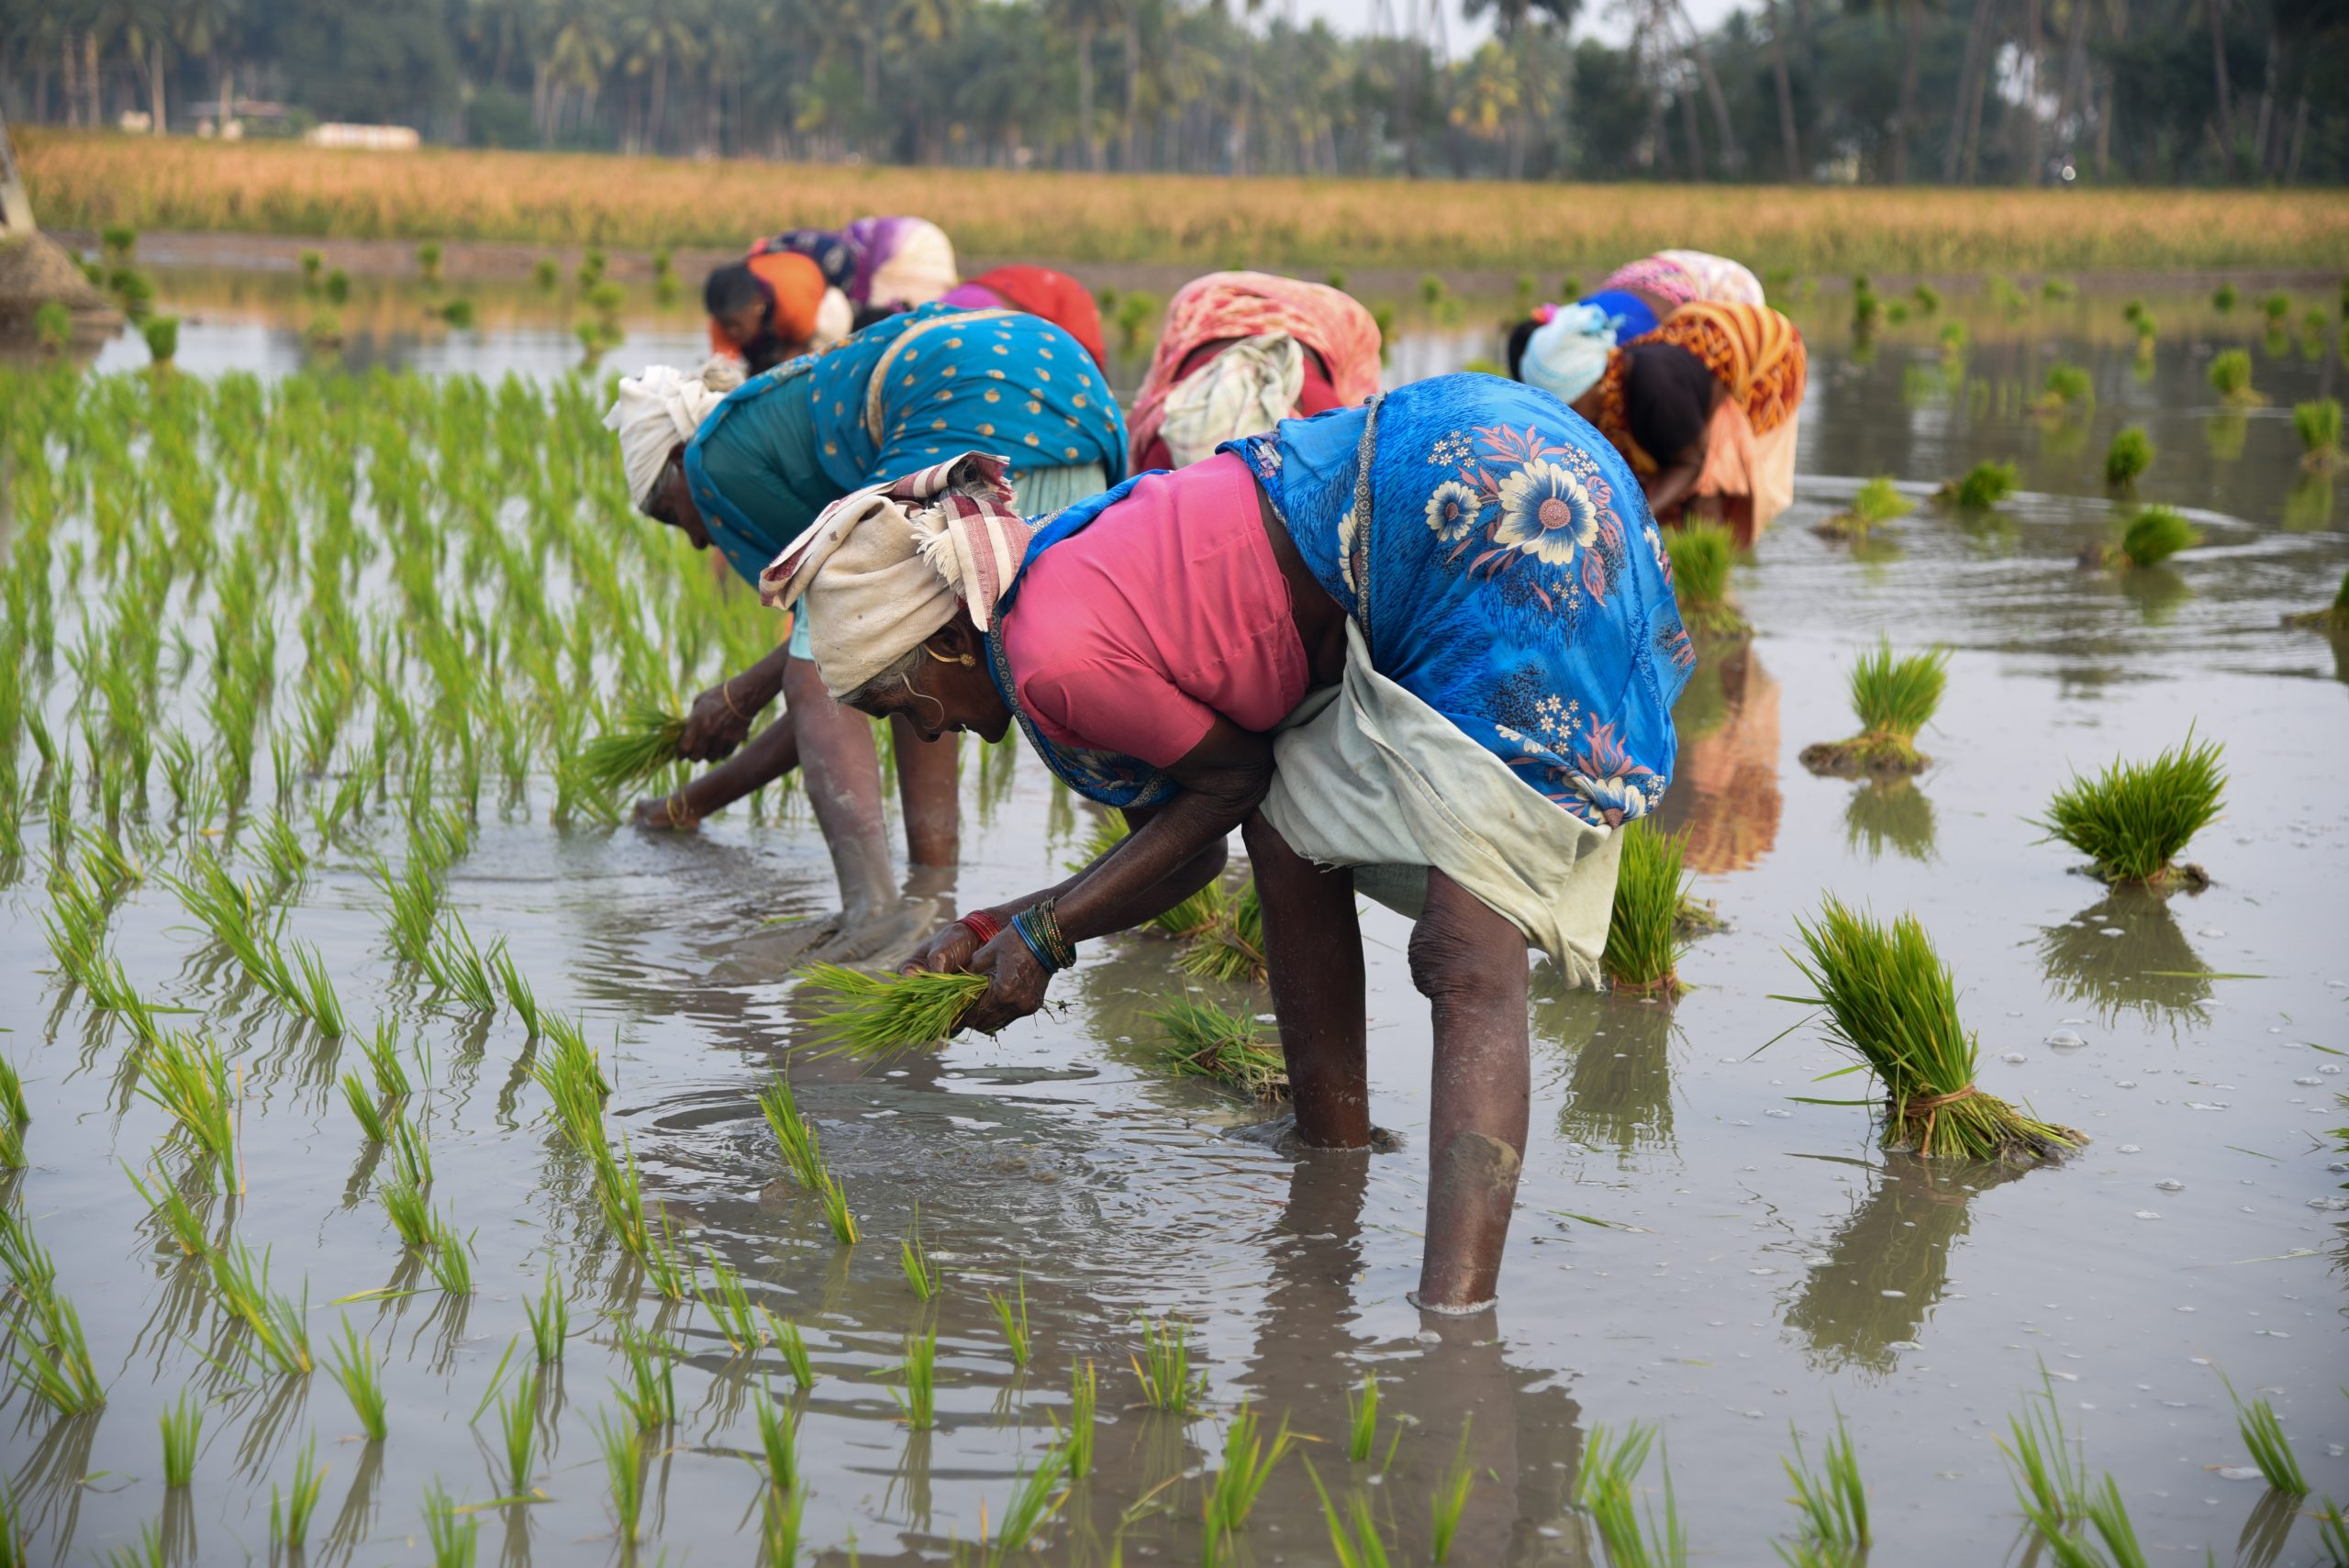 Farmers planting rice plants in a field